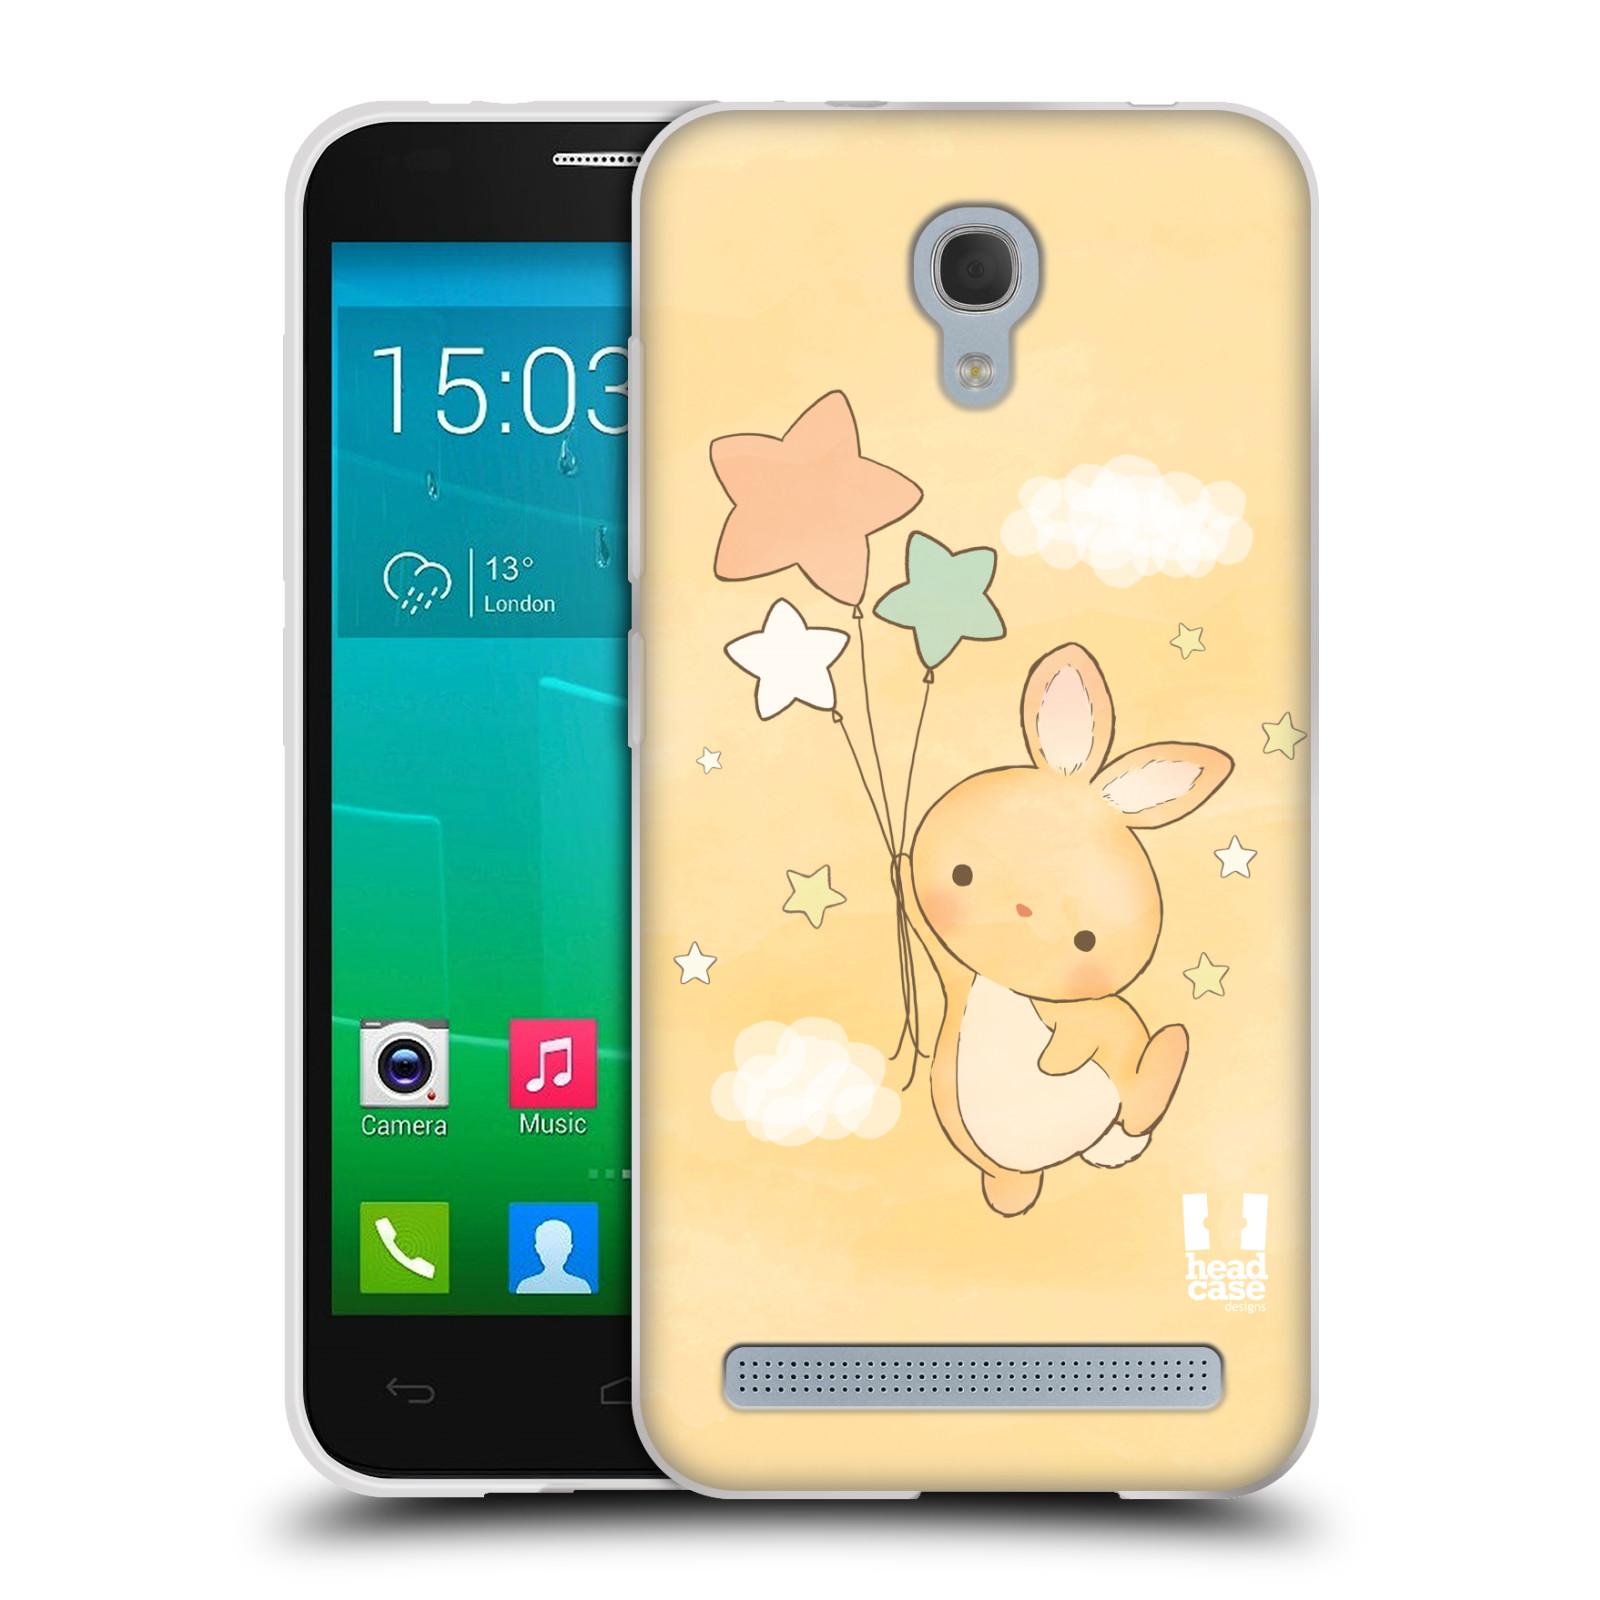 HEAD CASE silikonový obal na mobil Alcatel Idol 2 MINI S 6036Y vzor králíček a hvězdy žlutá